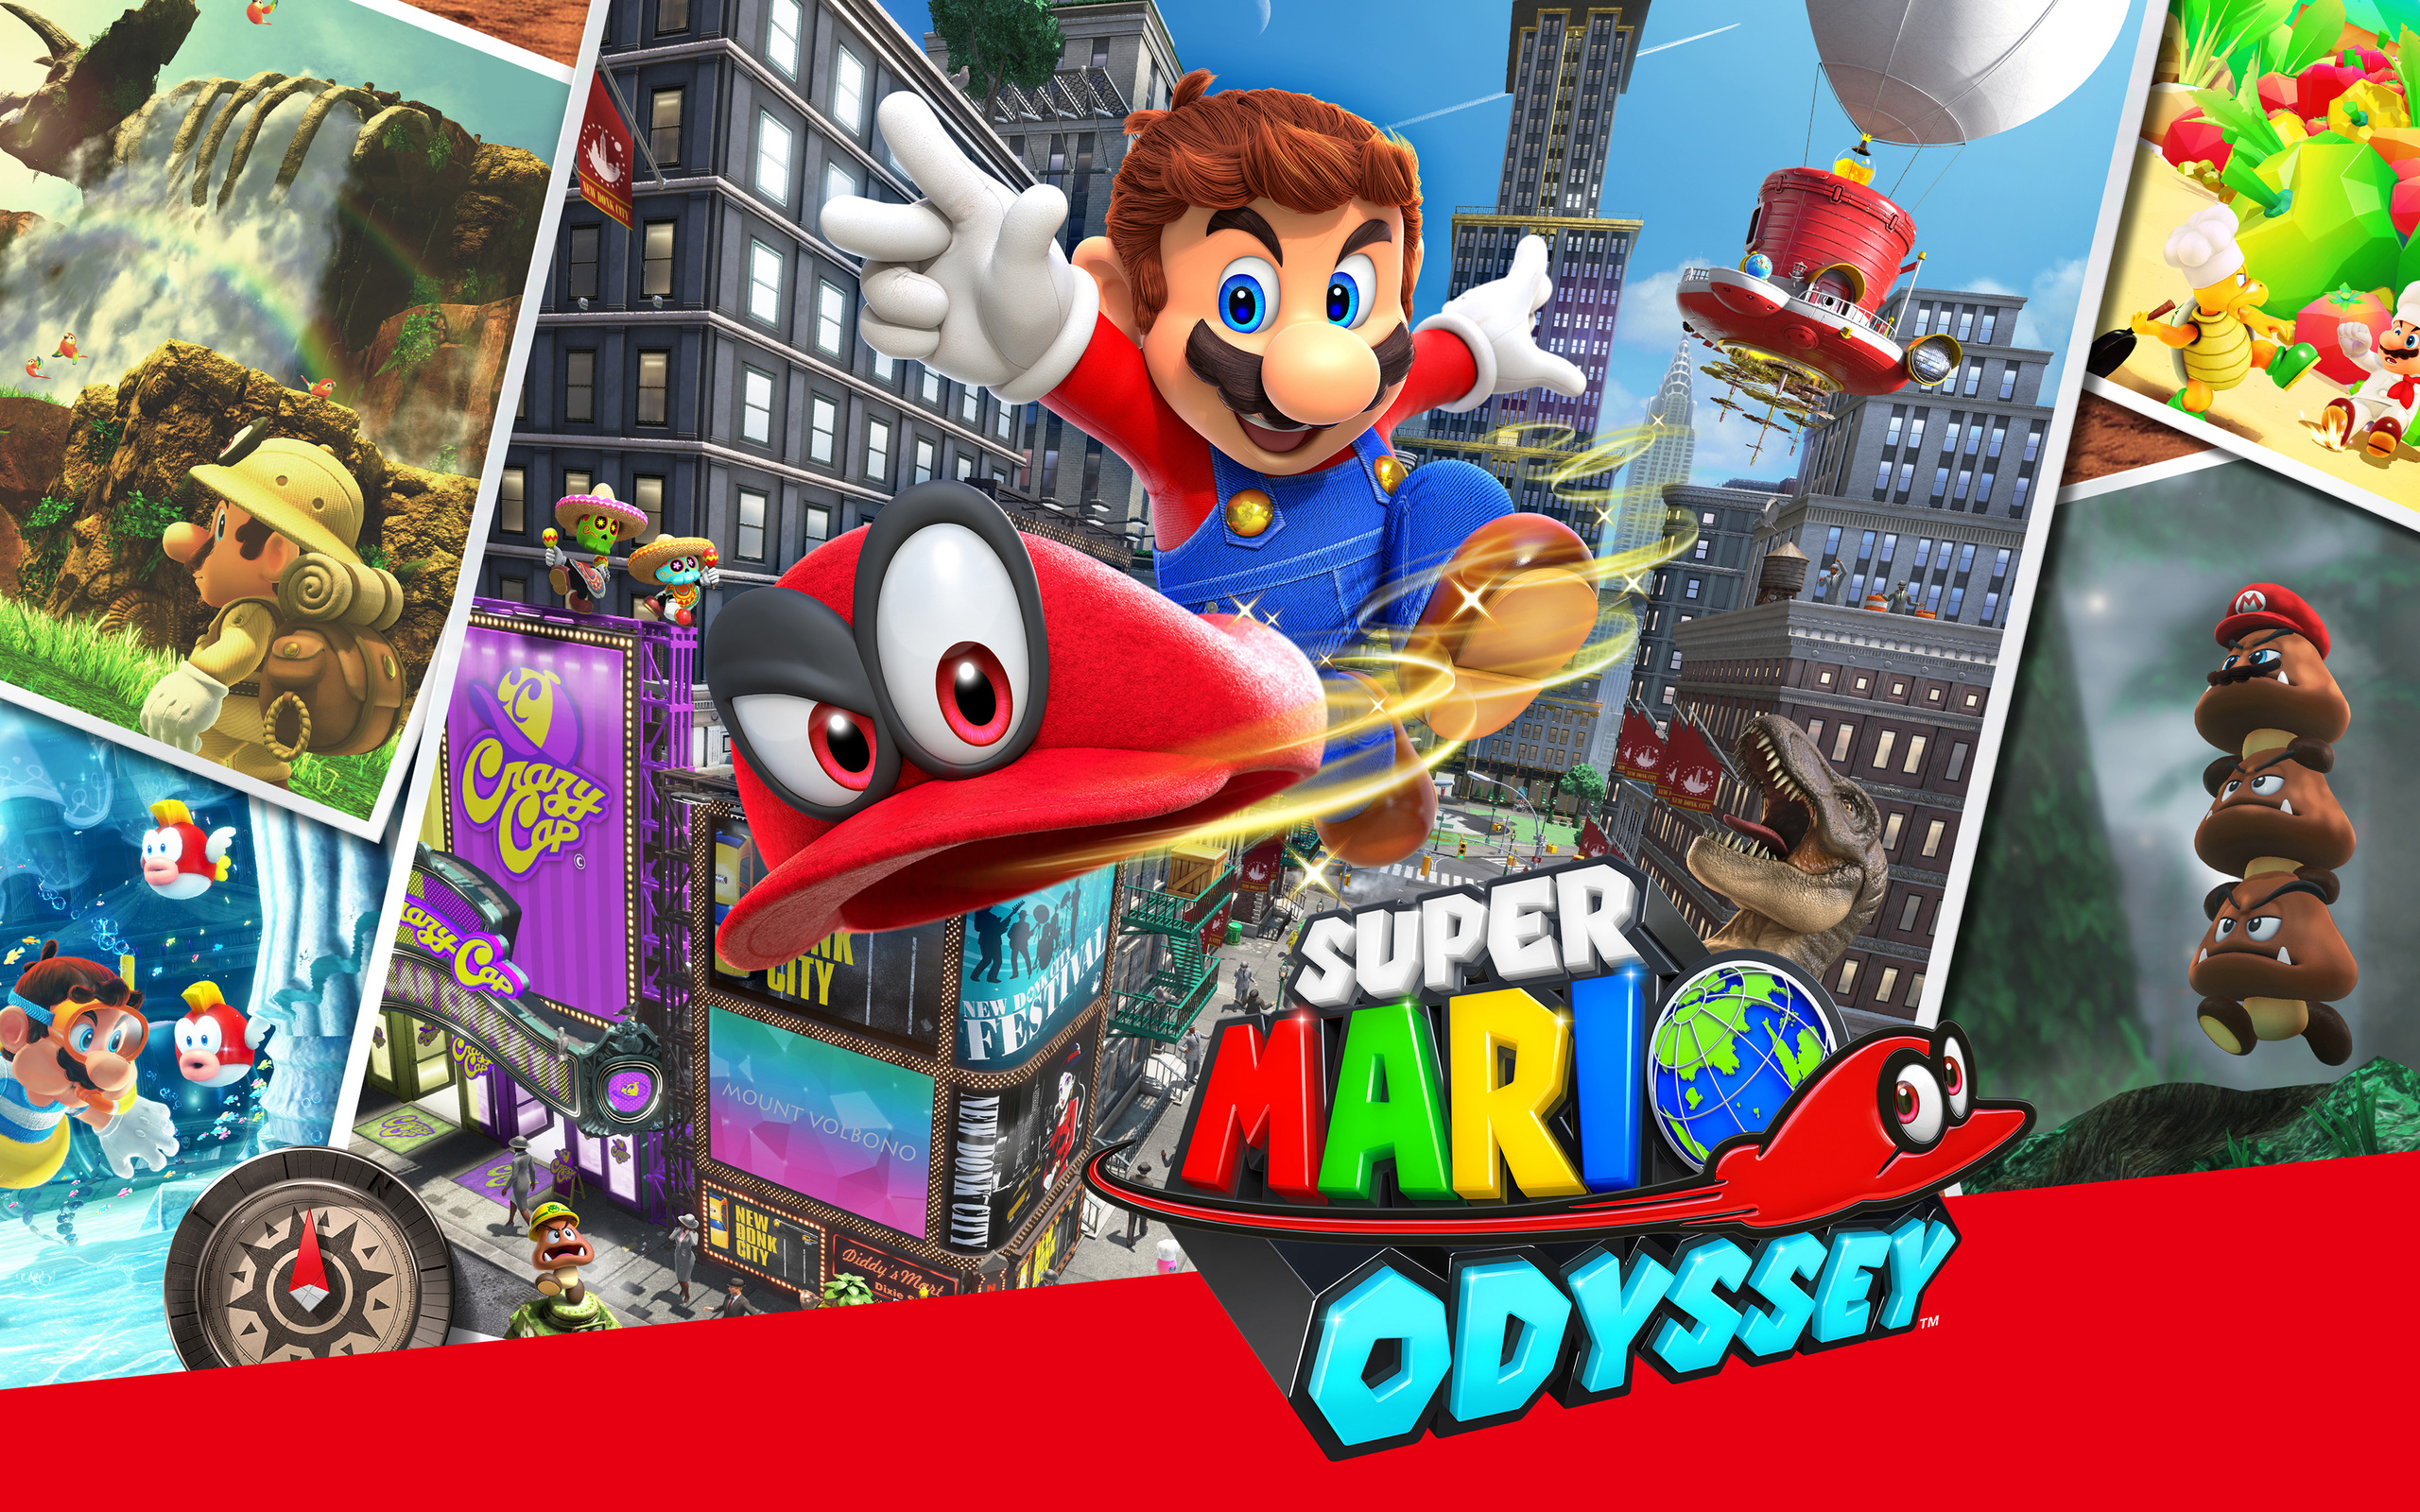 Super Mario Galaxy or Super Mario Odyssey? And why? | ResetEra